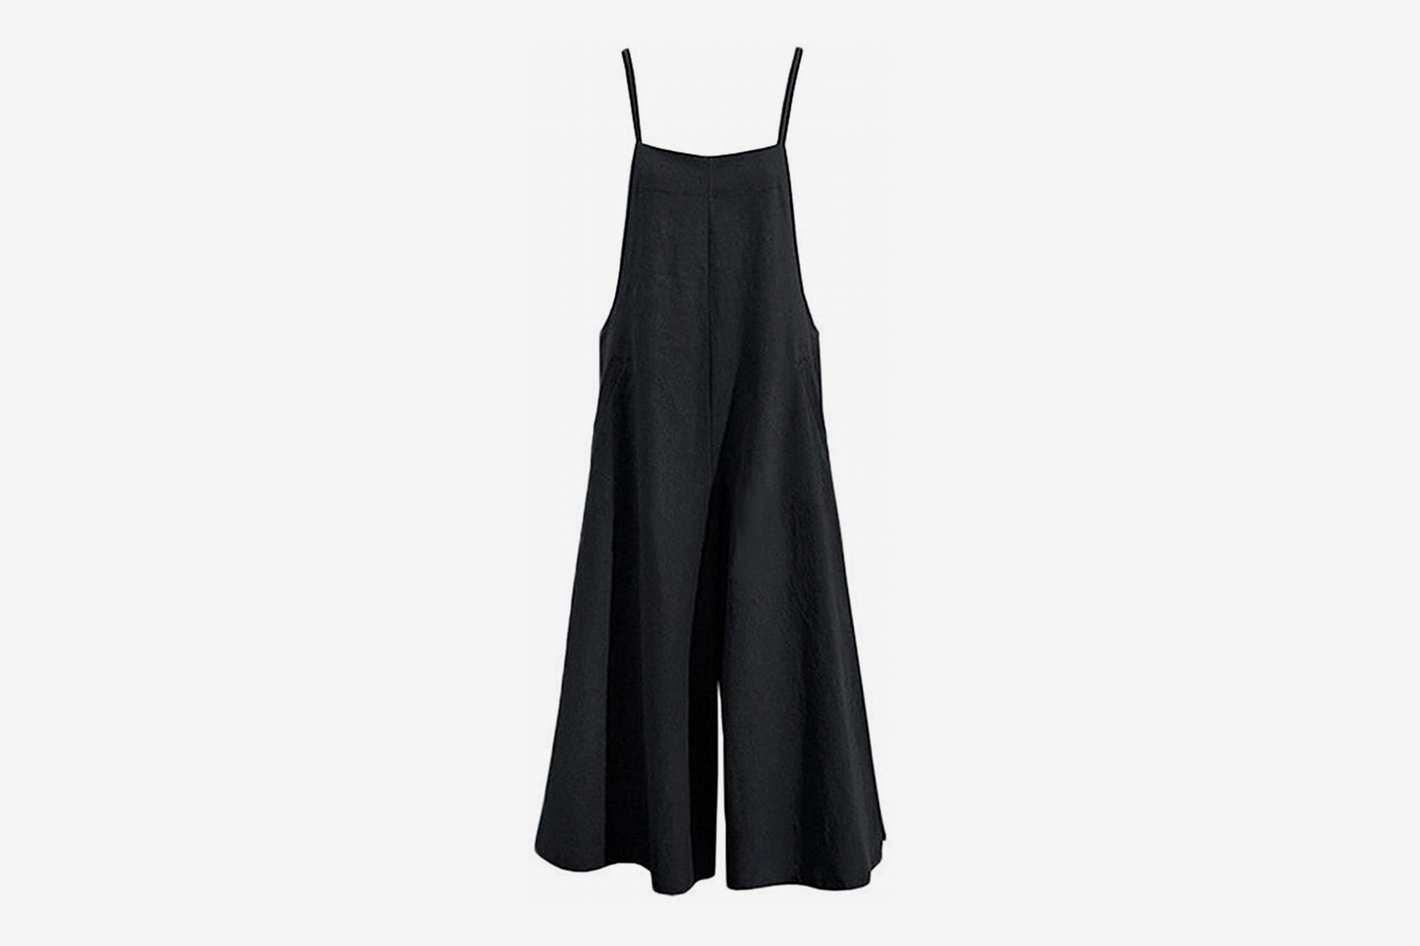 YESNO Women Casual Linen Cropped Bib Pants Wide Leg Jumpsuit